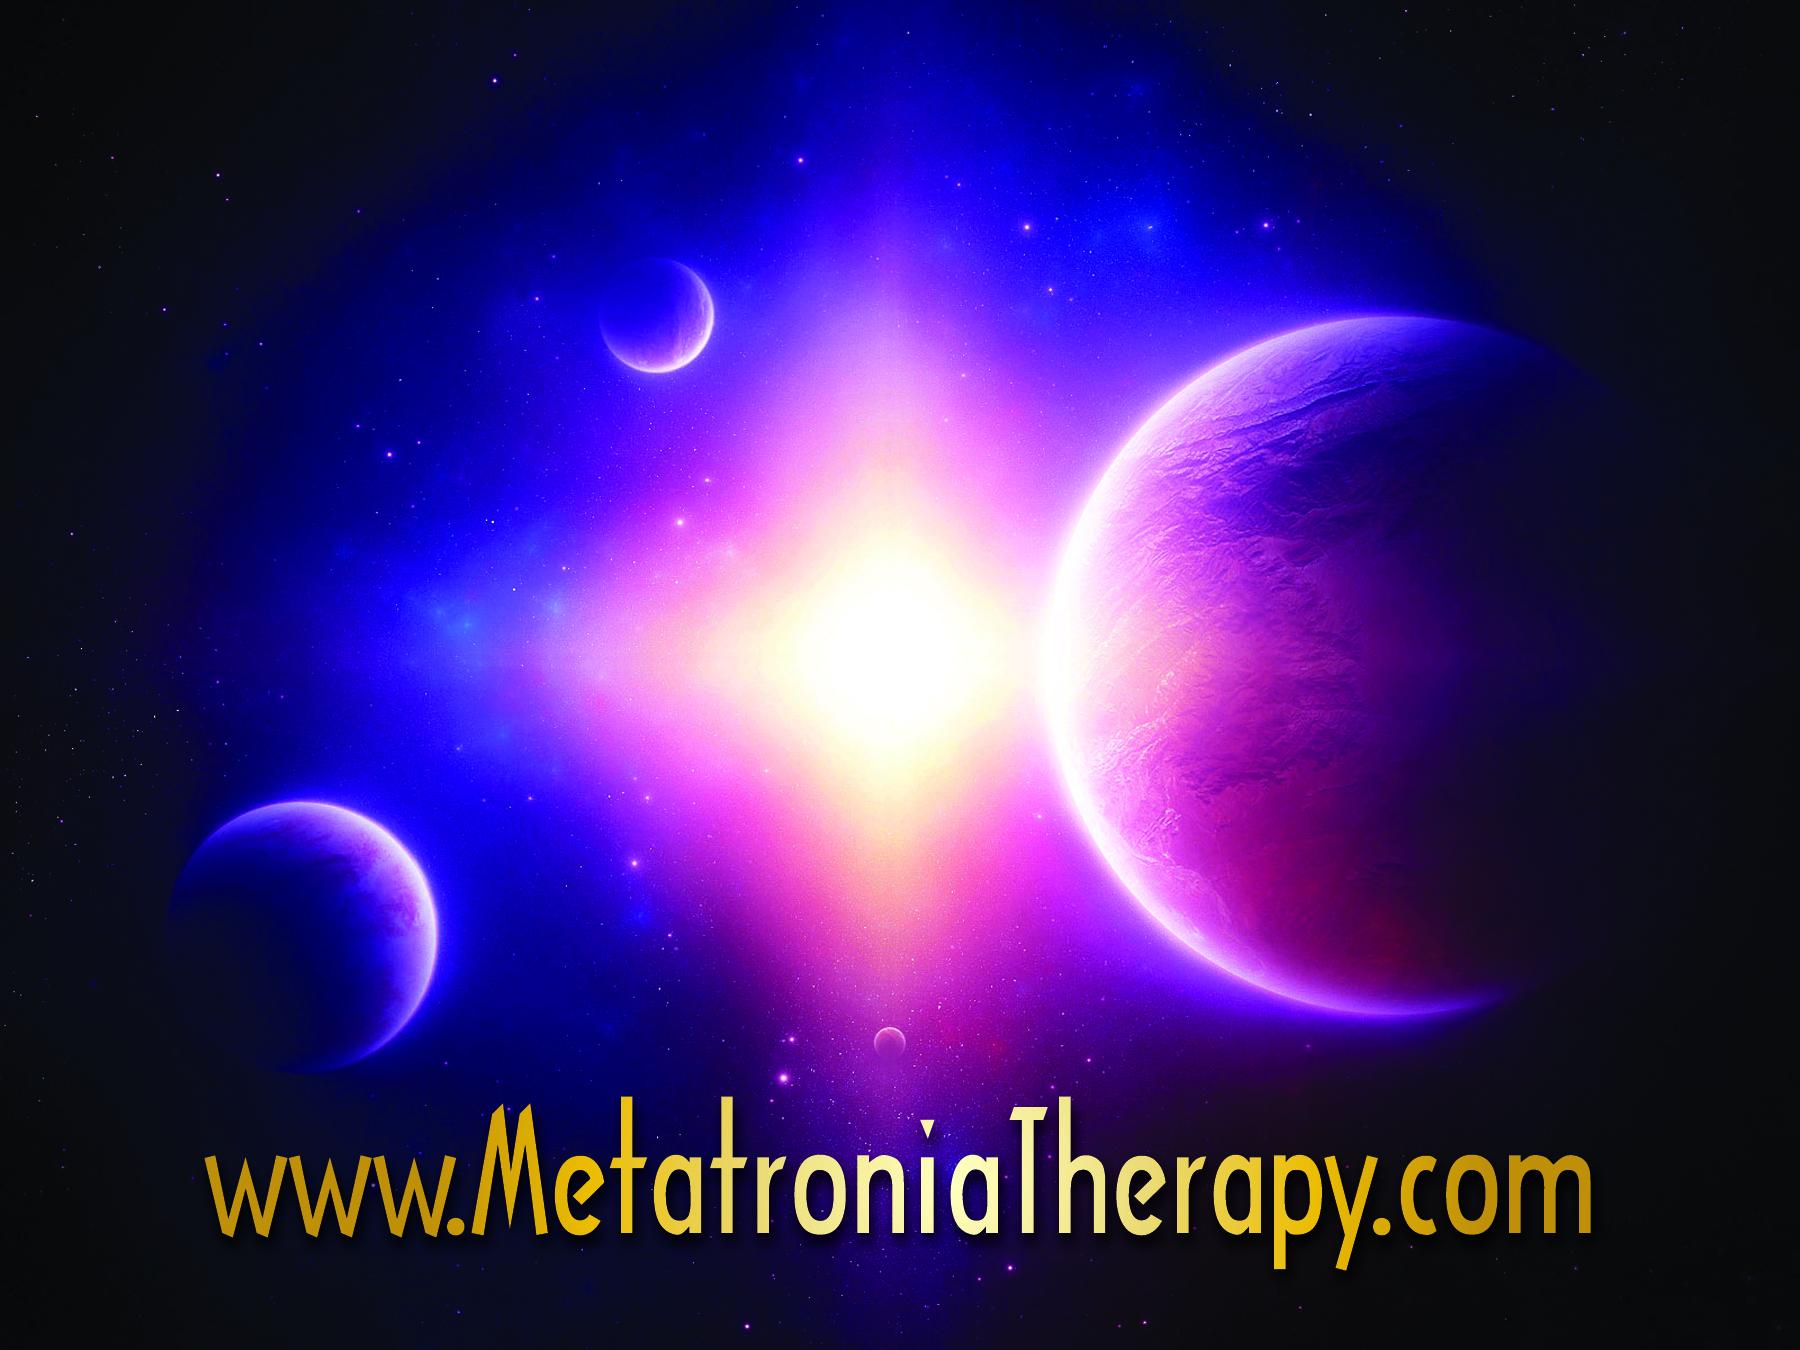 metatron site logo image1